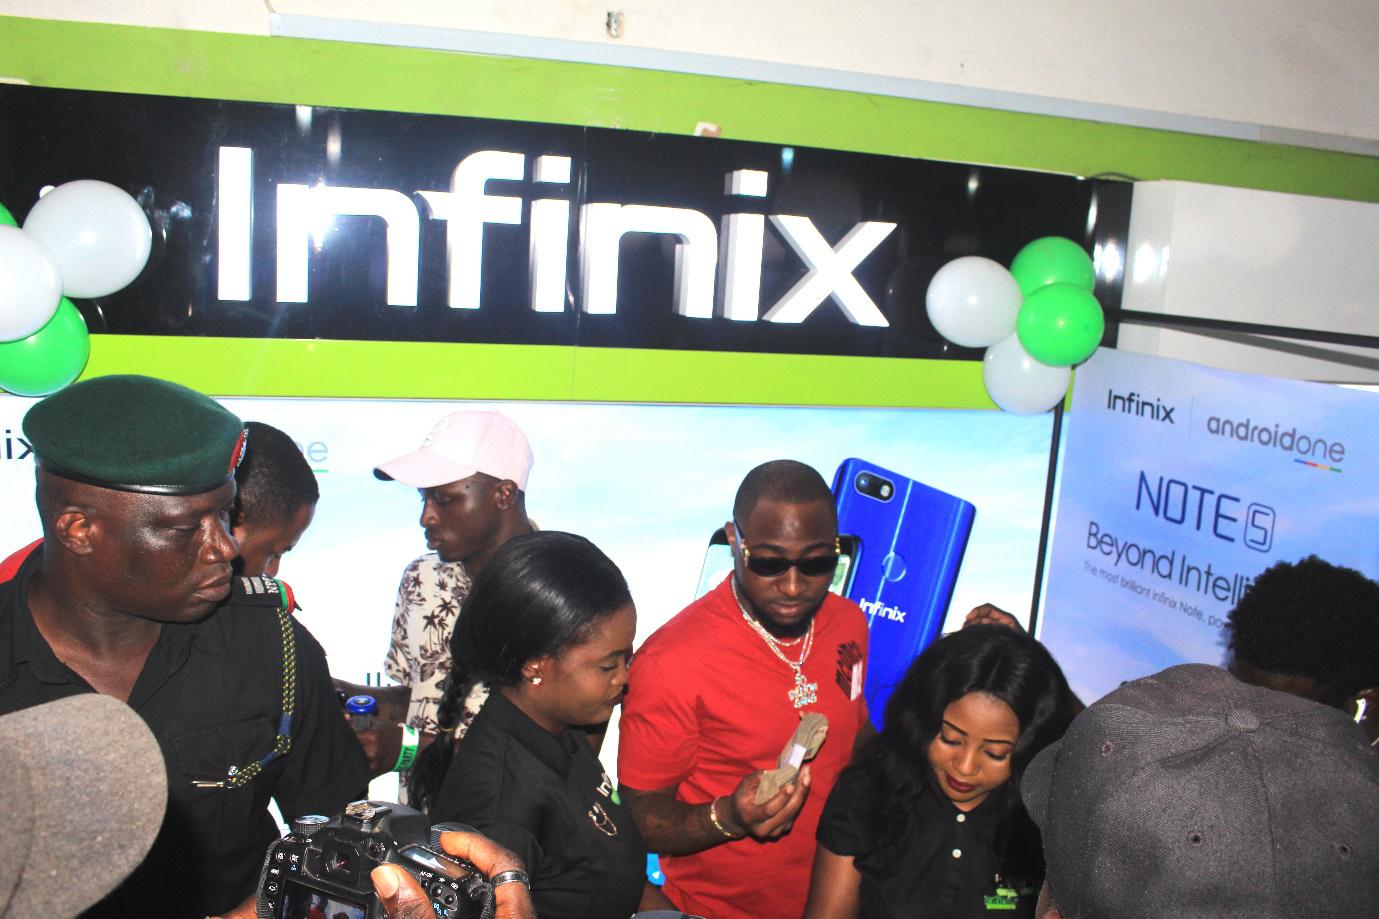 Davido visits Infinix authorised retail store and buys new Infinix Note 5